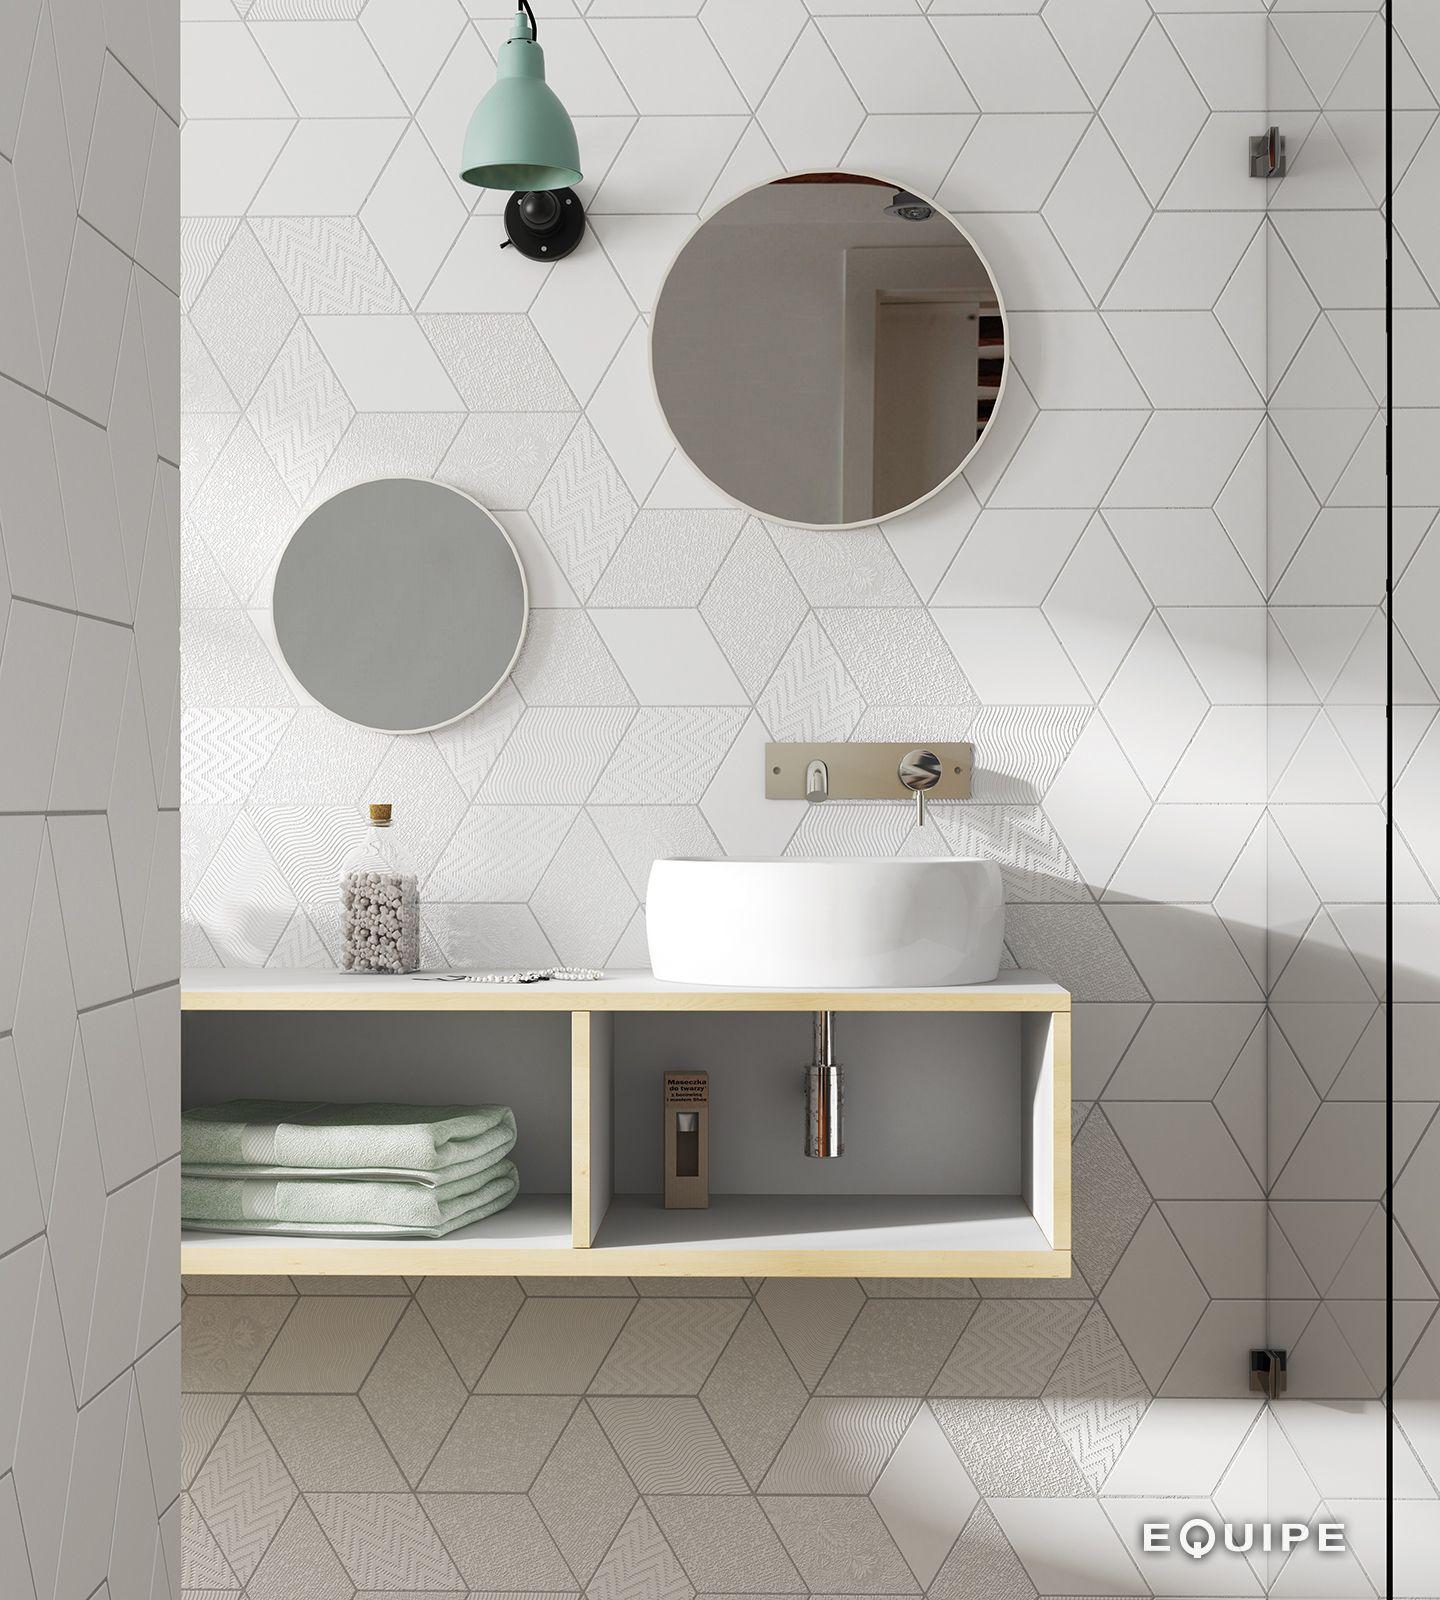 Rhombus White 14x24 - Badkamer   Pinterest - Badkamer, Wc en Wastafel